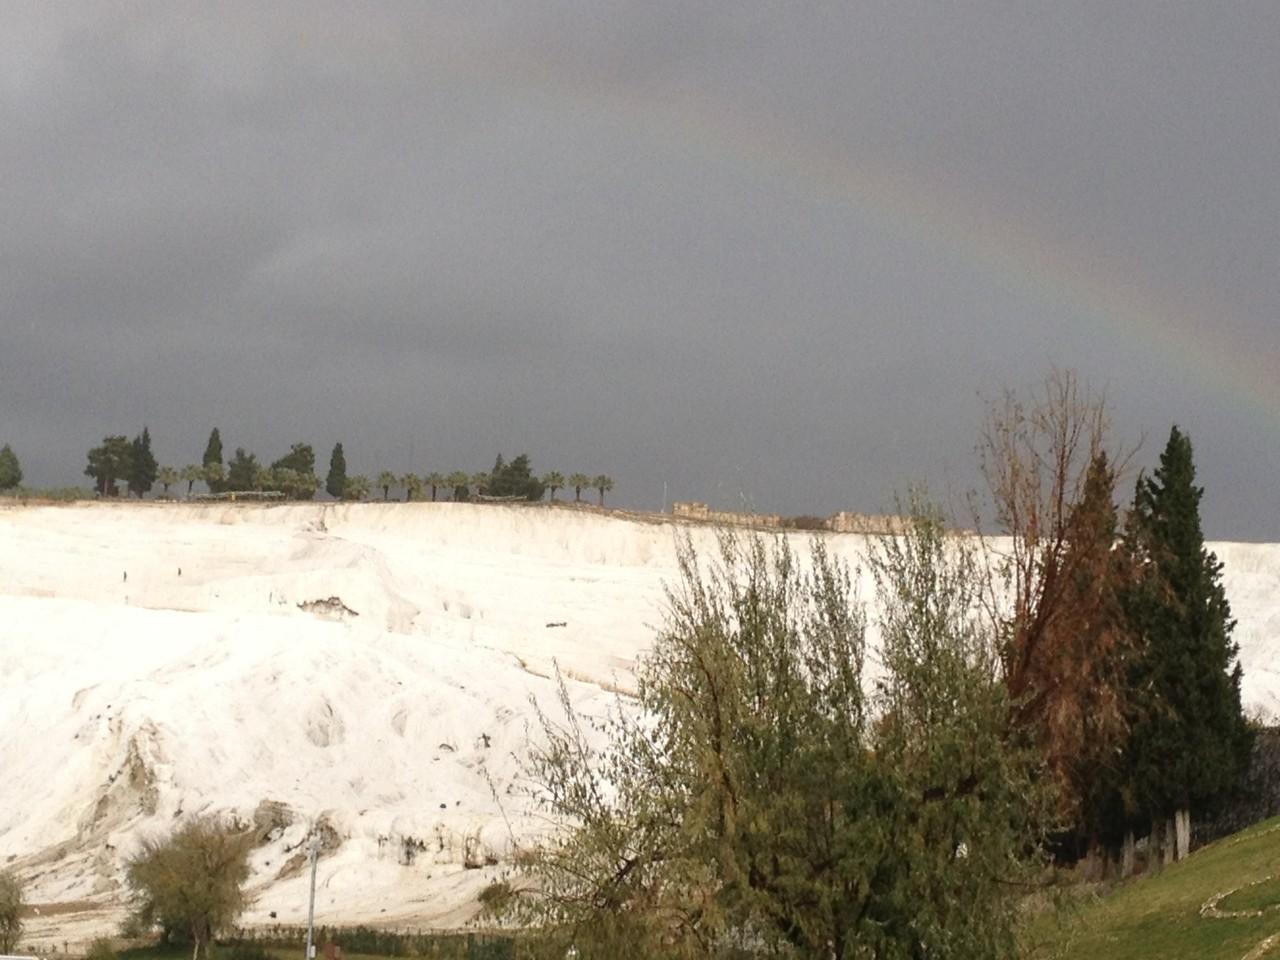 Ankunft in Pamukkale mit Regenbogen